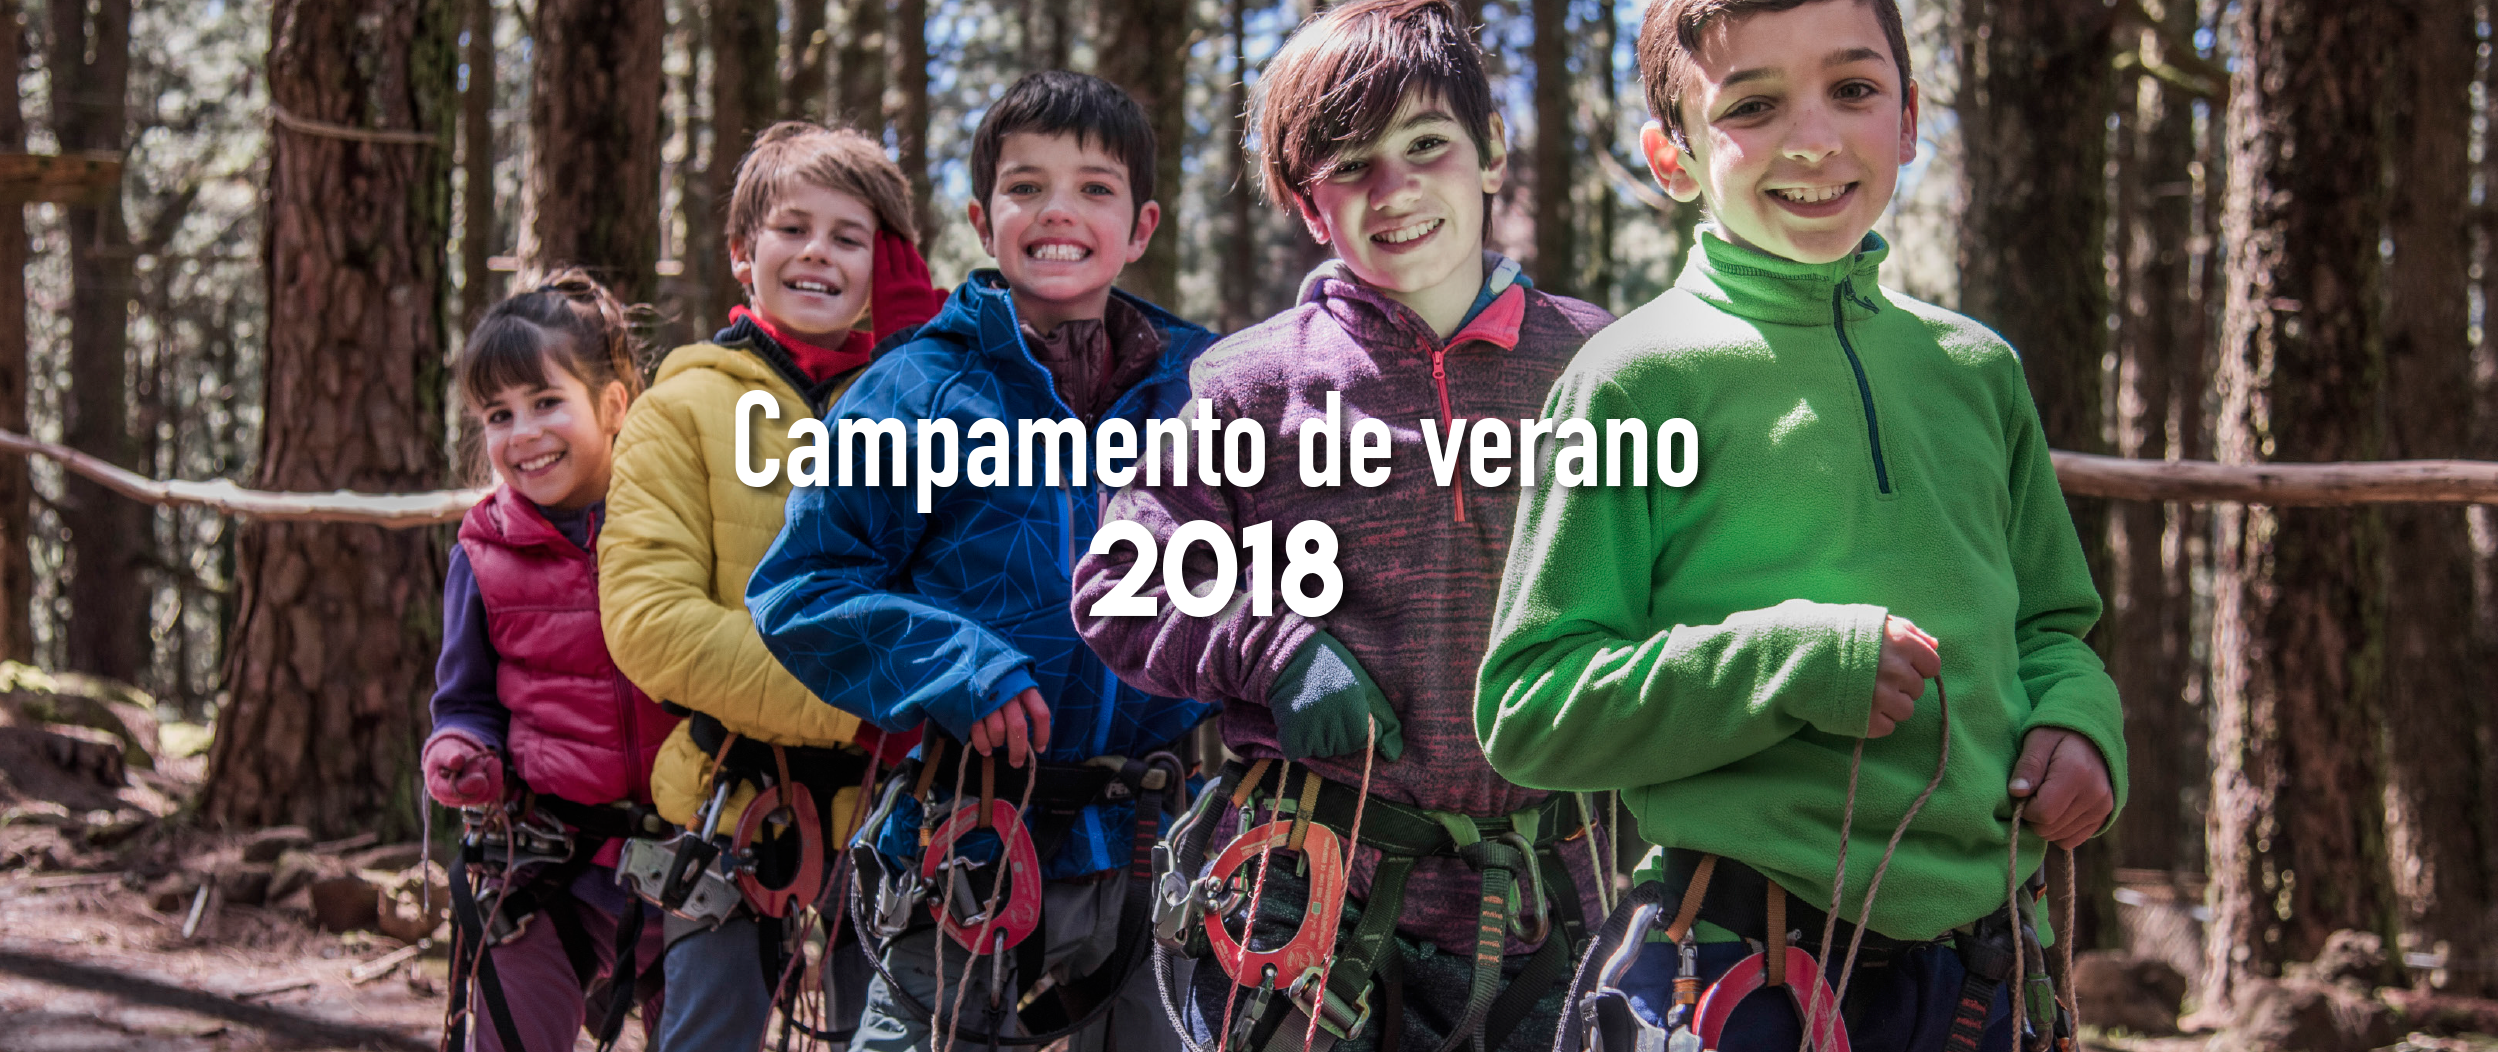 campamento de verano 2018 forestal park tenerife